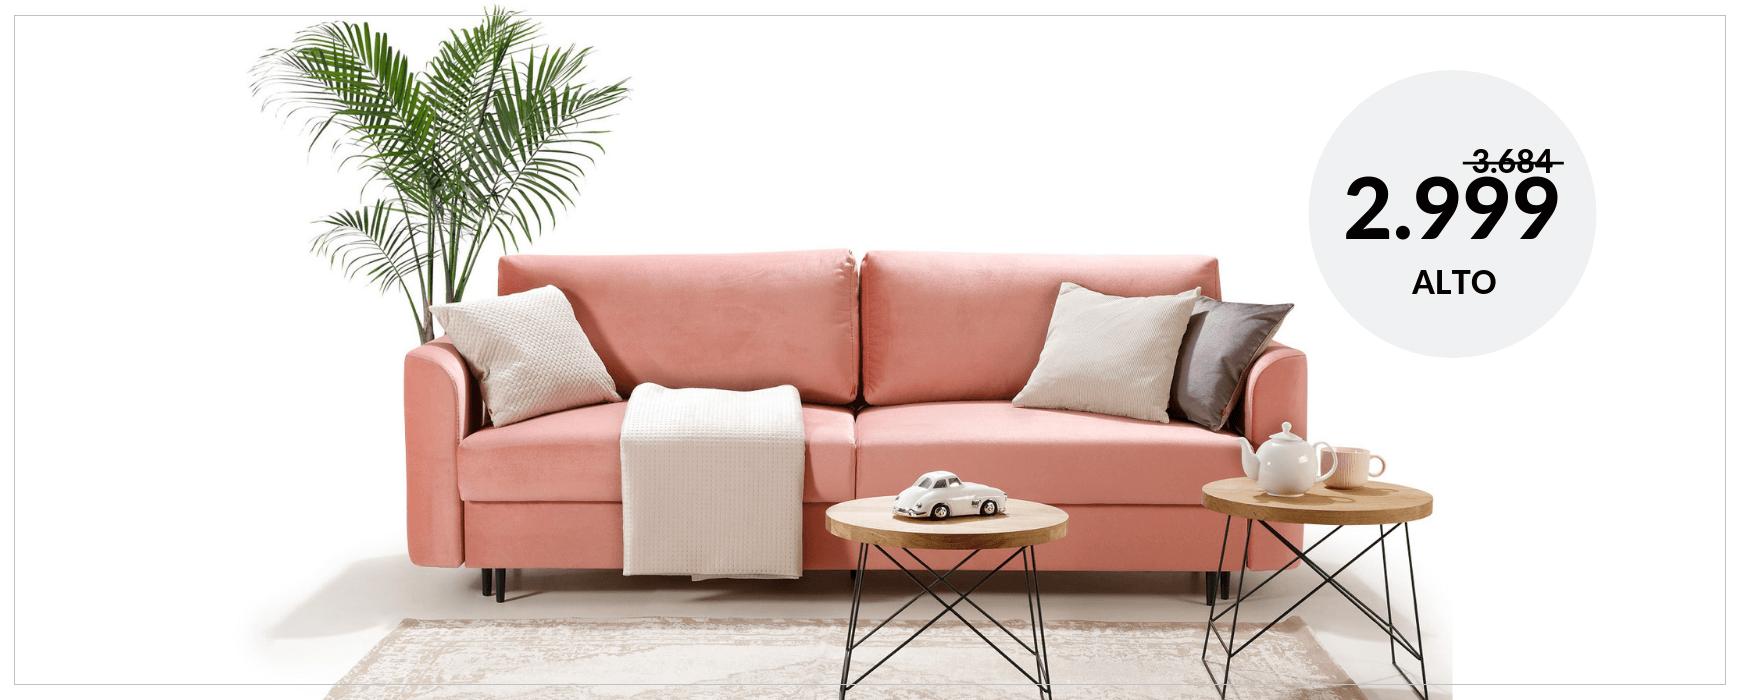 Poznaj nasze komfortowe i funkcjonalne sofy!